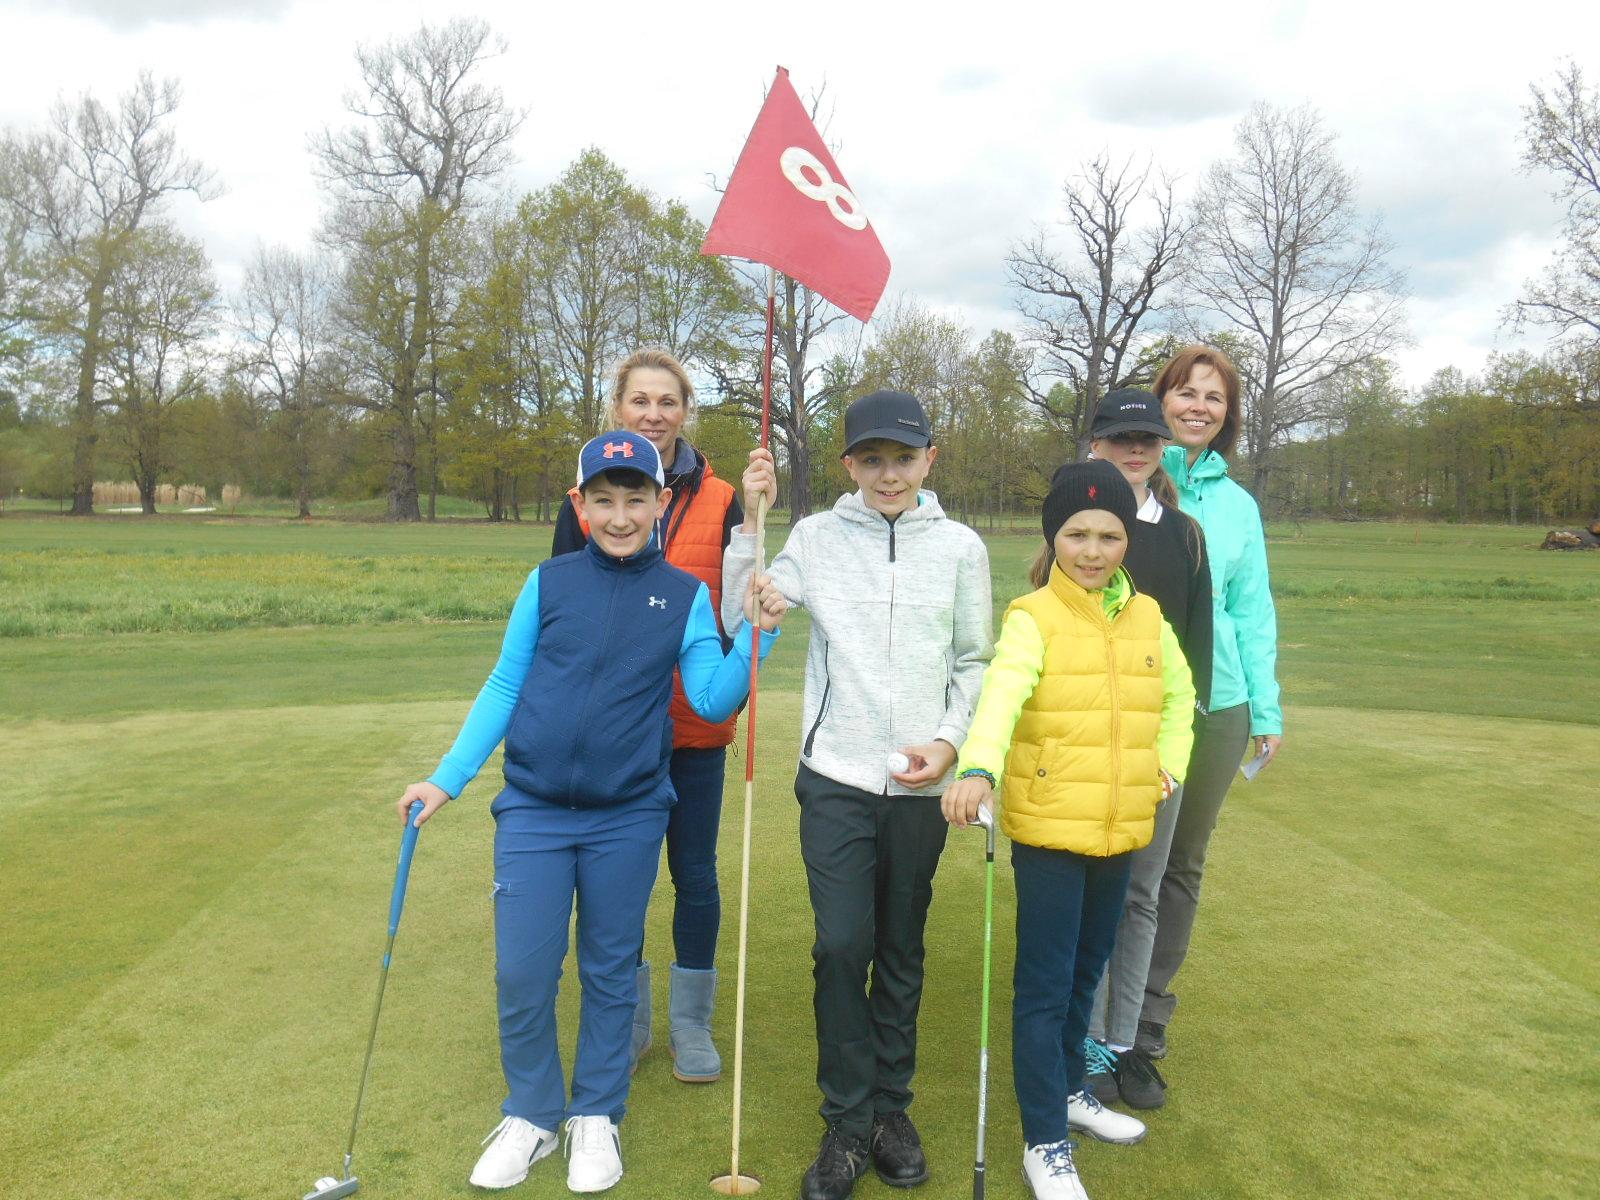 V neděli  dne 28. 4.2019 se sešli naši junioři, aby se utkali v jejich prvním turnaji této sezóny - Zahajovacím Junior Golf Cupu 2019